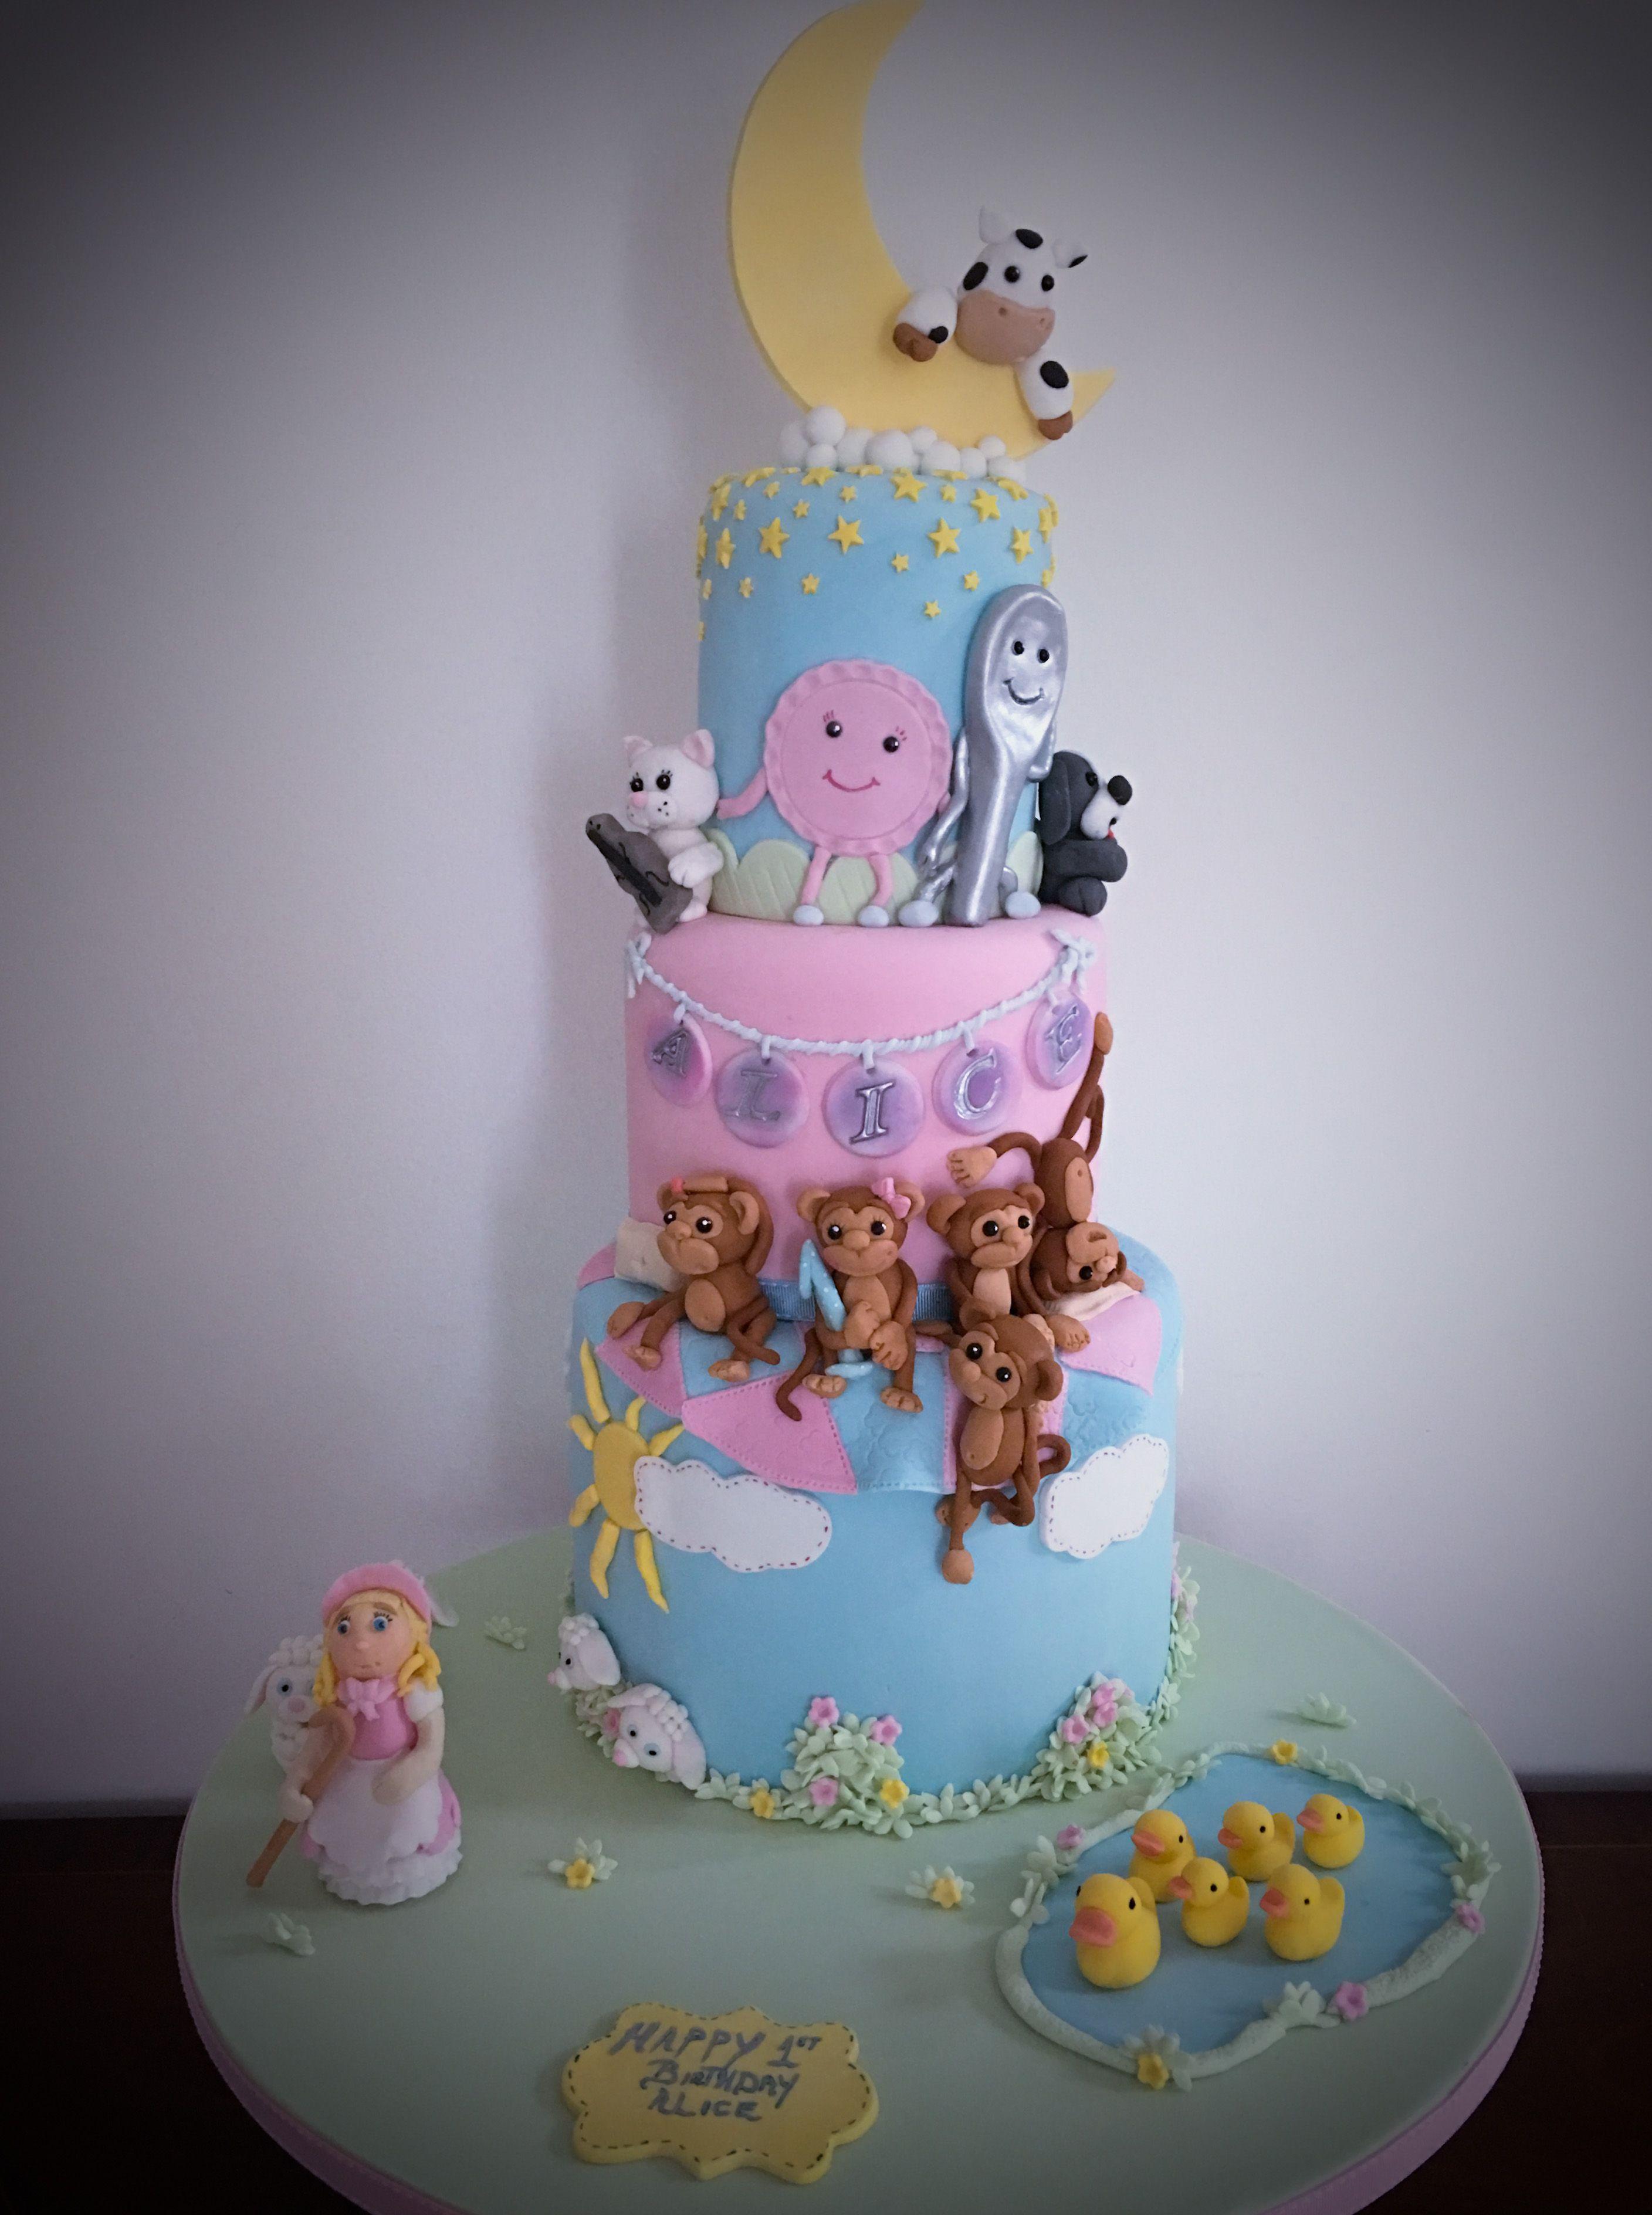 Nursery Rhyme Cake 1st Birthday Cakes Nursery Rhyme Baby Shower